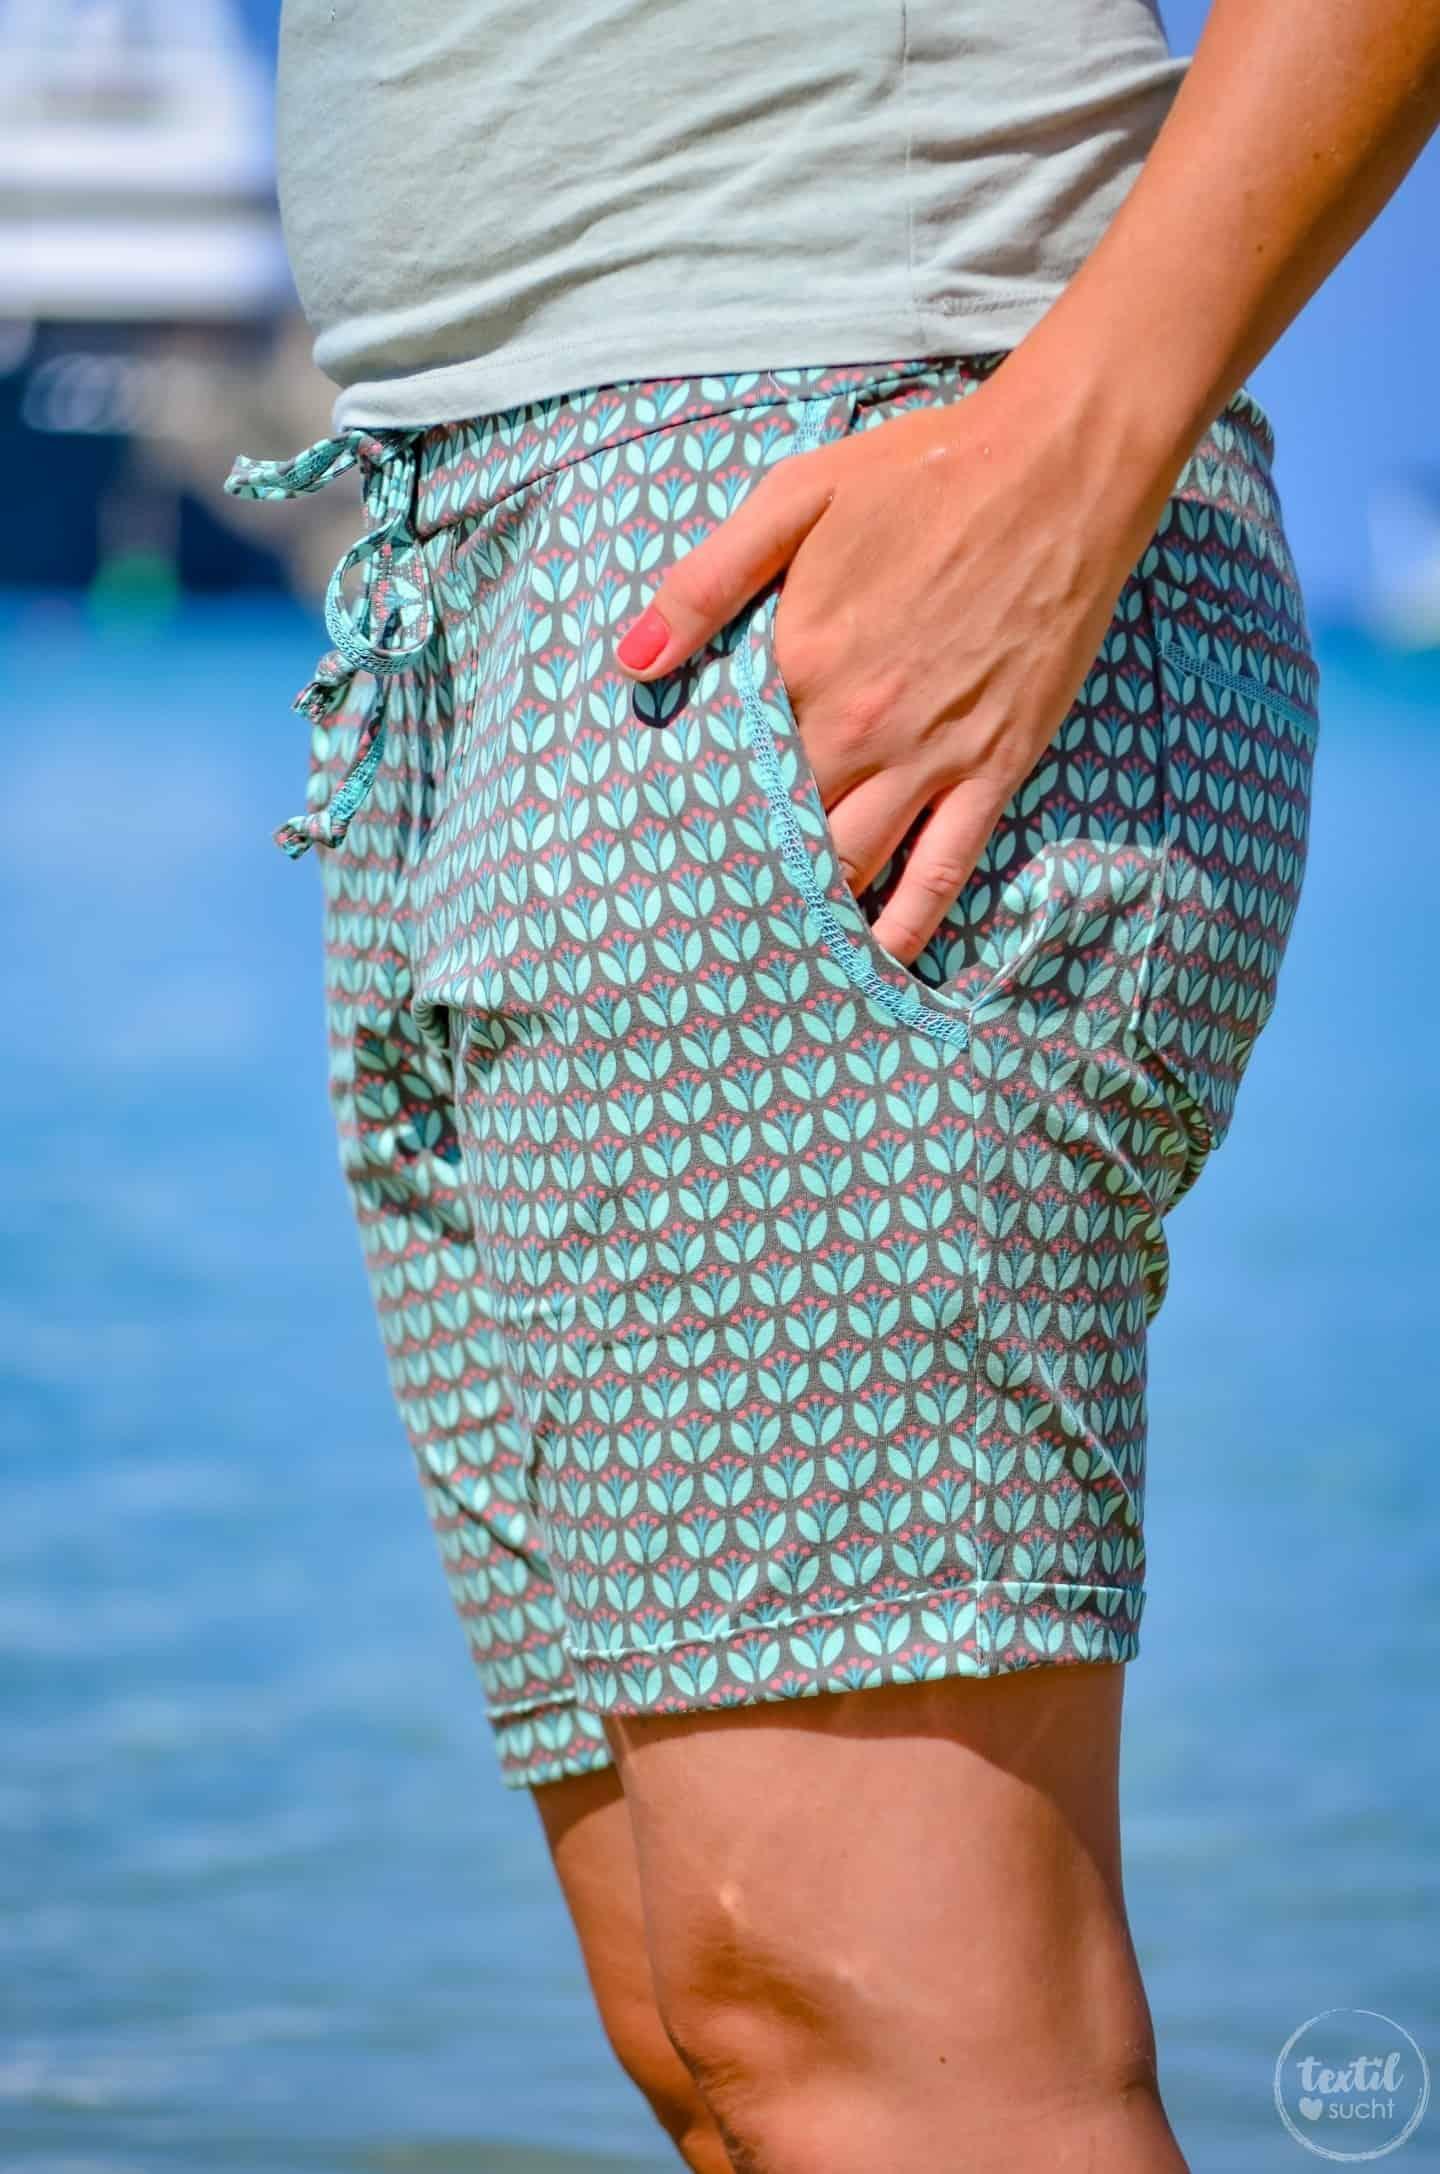 Nähen für den Strand: Schnittmuster Velara als Shorts - Bild 4 | textilsucht.de